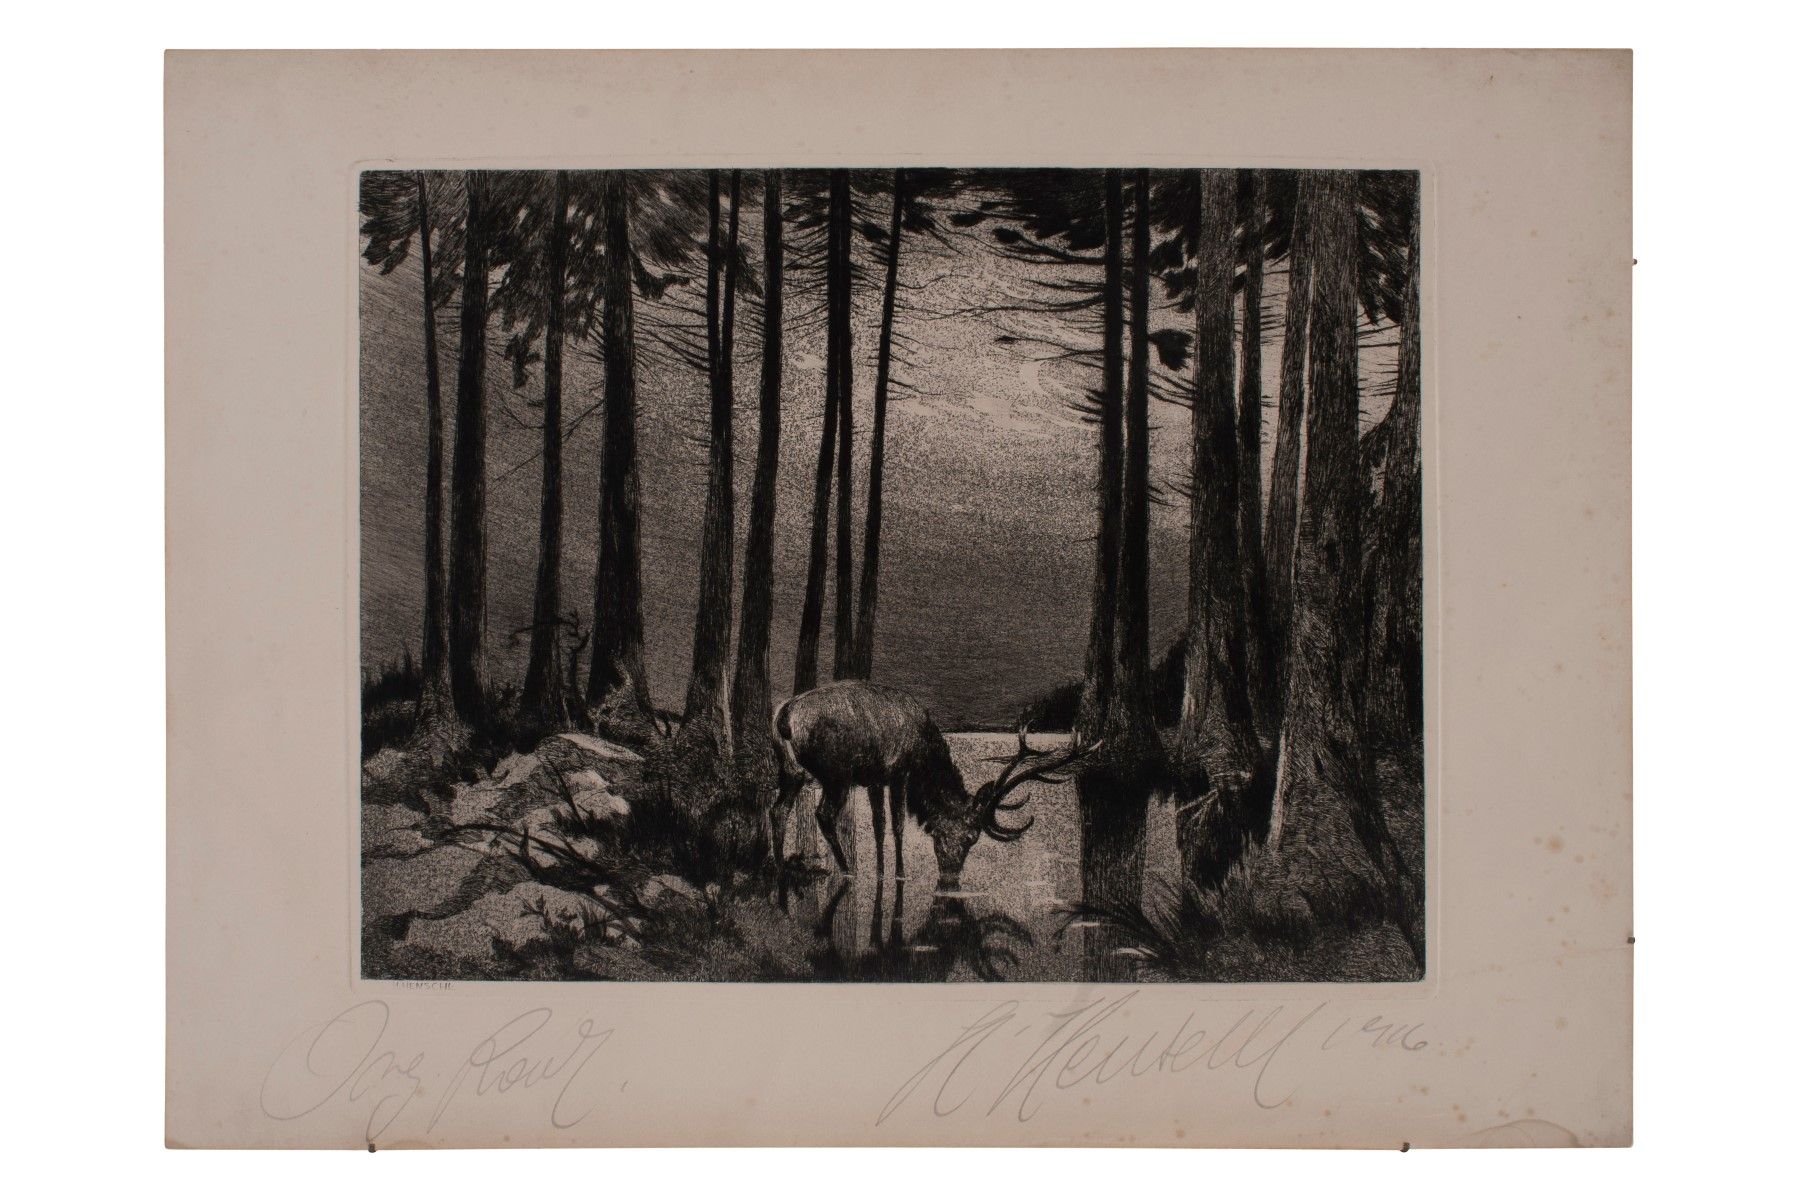 #43 Hugo Henschl (1879-1929), Deer in the moonlight at the lake | Hugo Henschel (1879-1929), Hirsch im Mondlicht am See Image